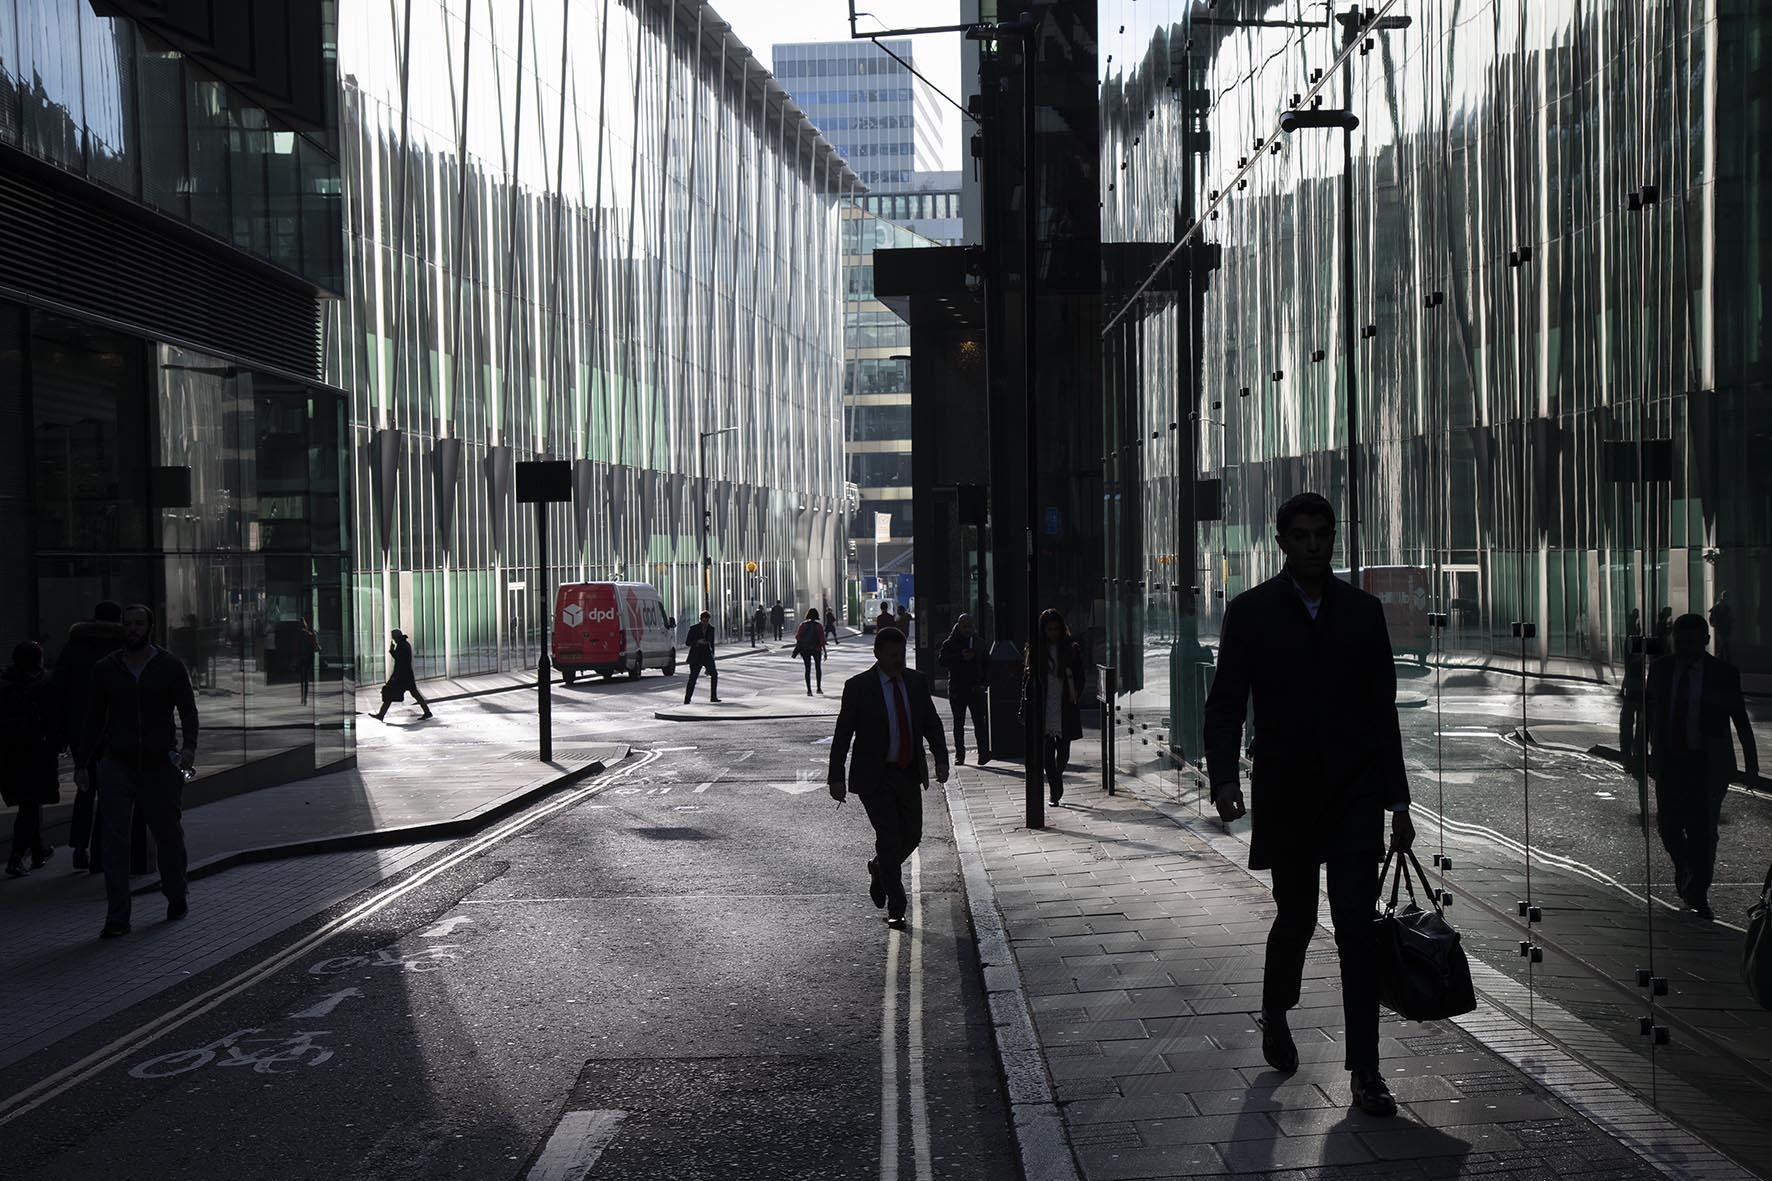 20190214_moorgate glass offices_004.jpg